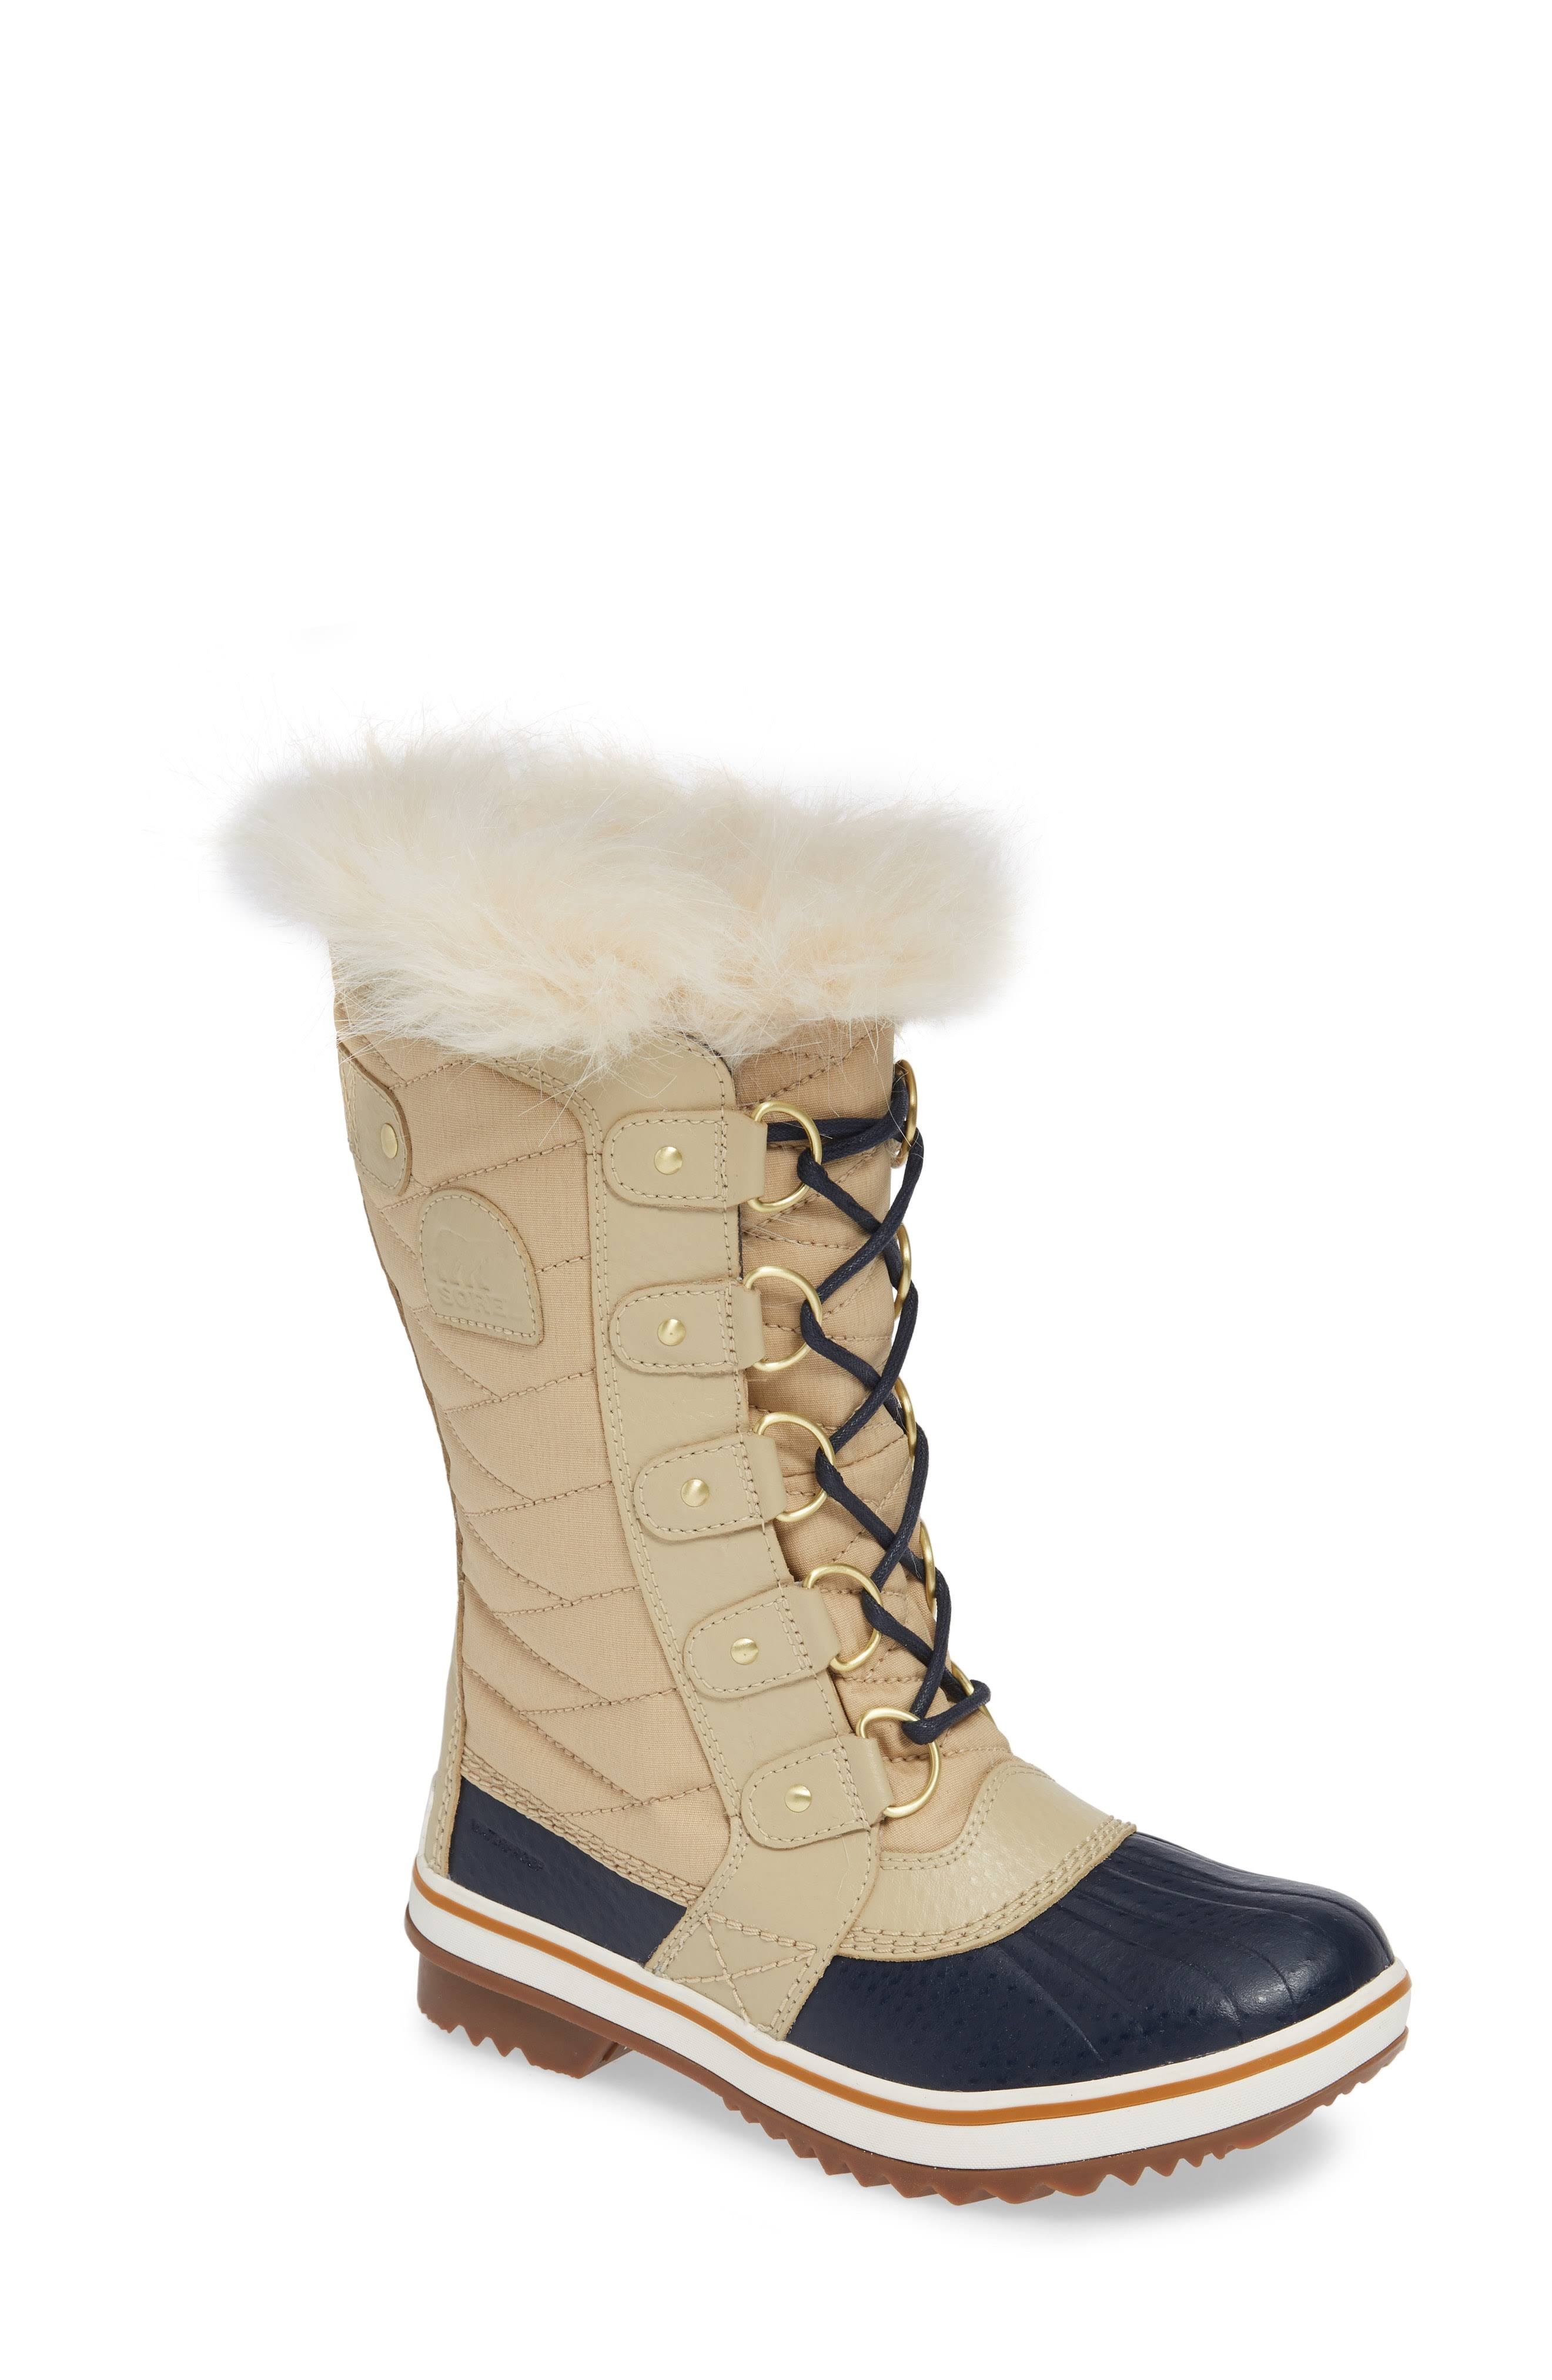 1690441241 Ii 5 5 Haferflocken Tofino Damen 5 Sorel Boot 5 5qnF4x0fwa